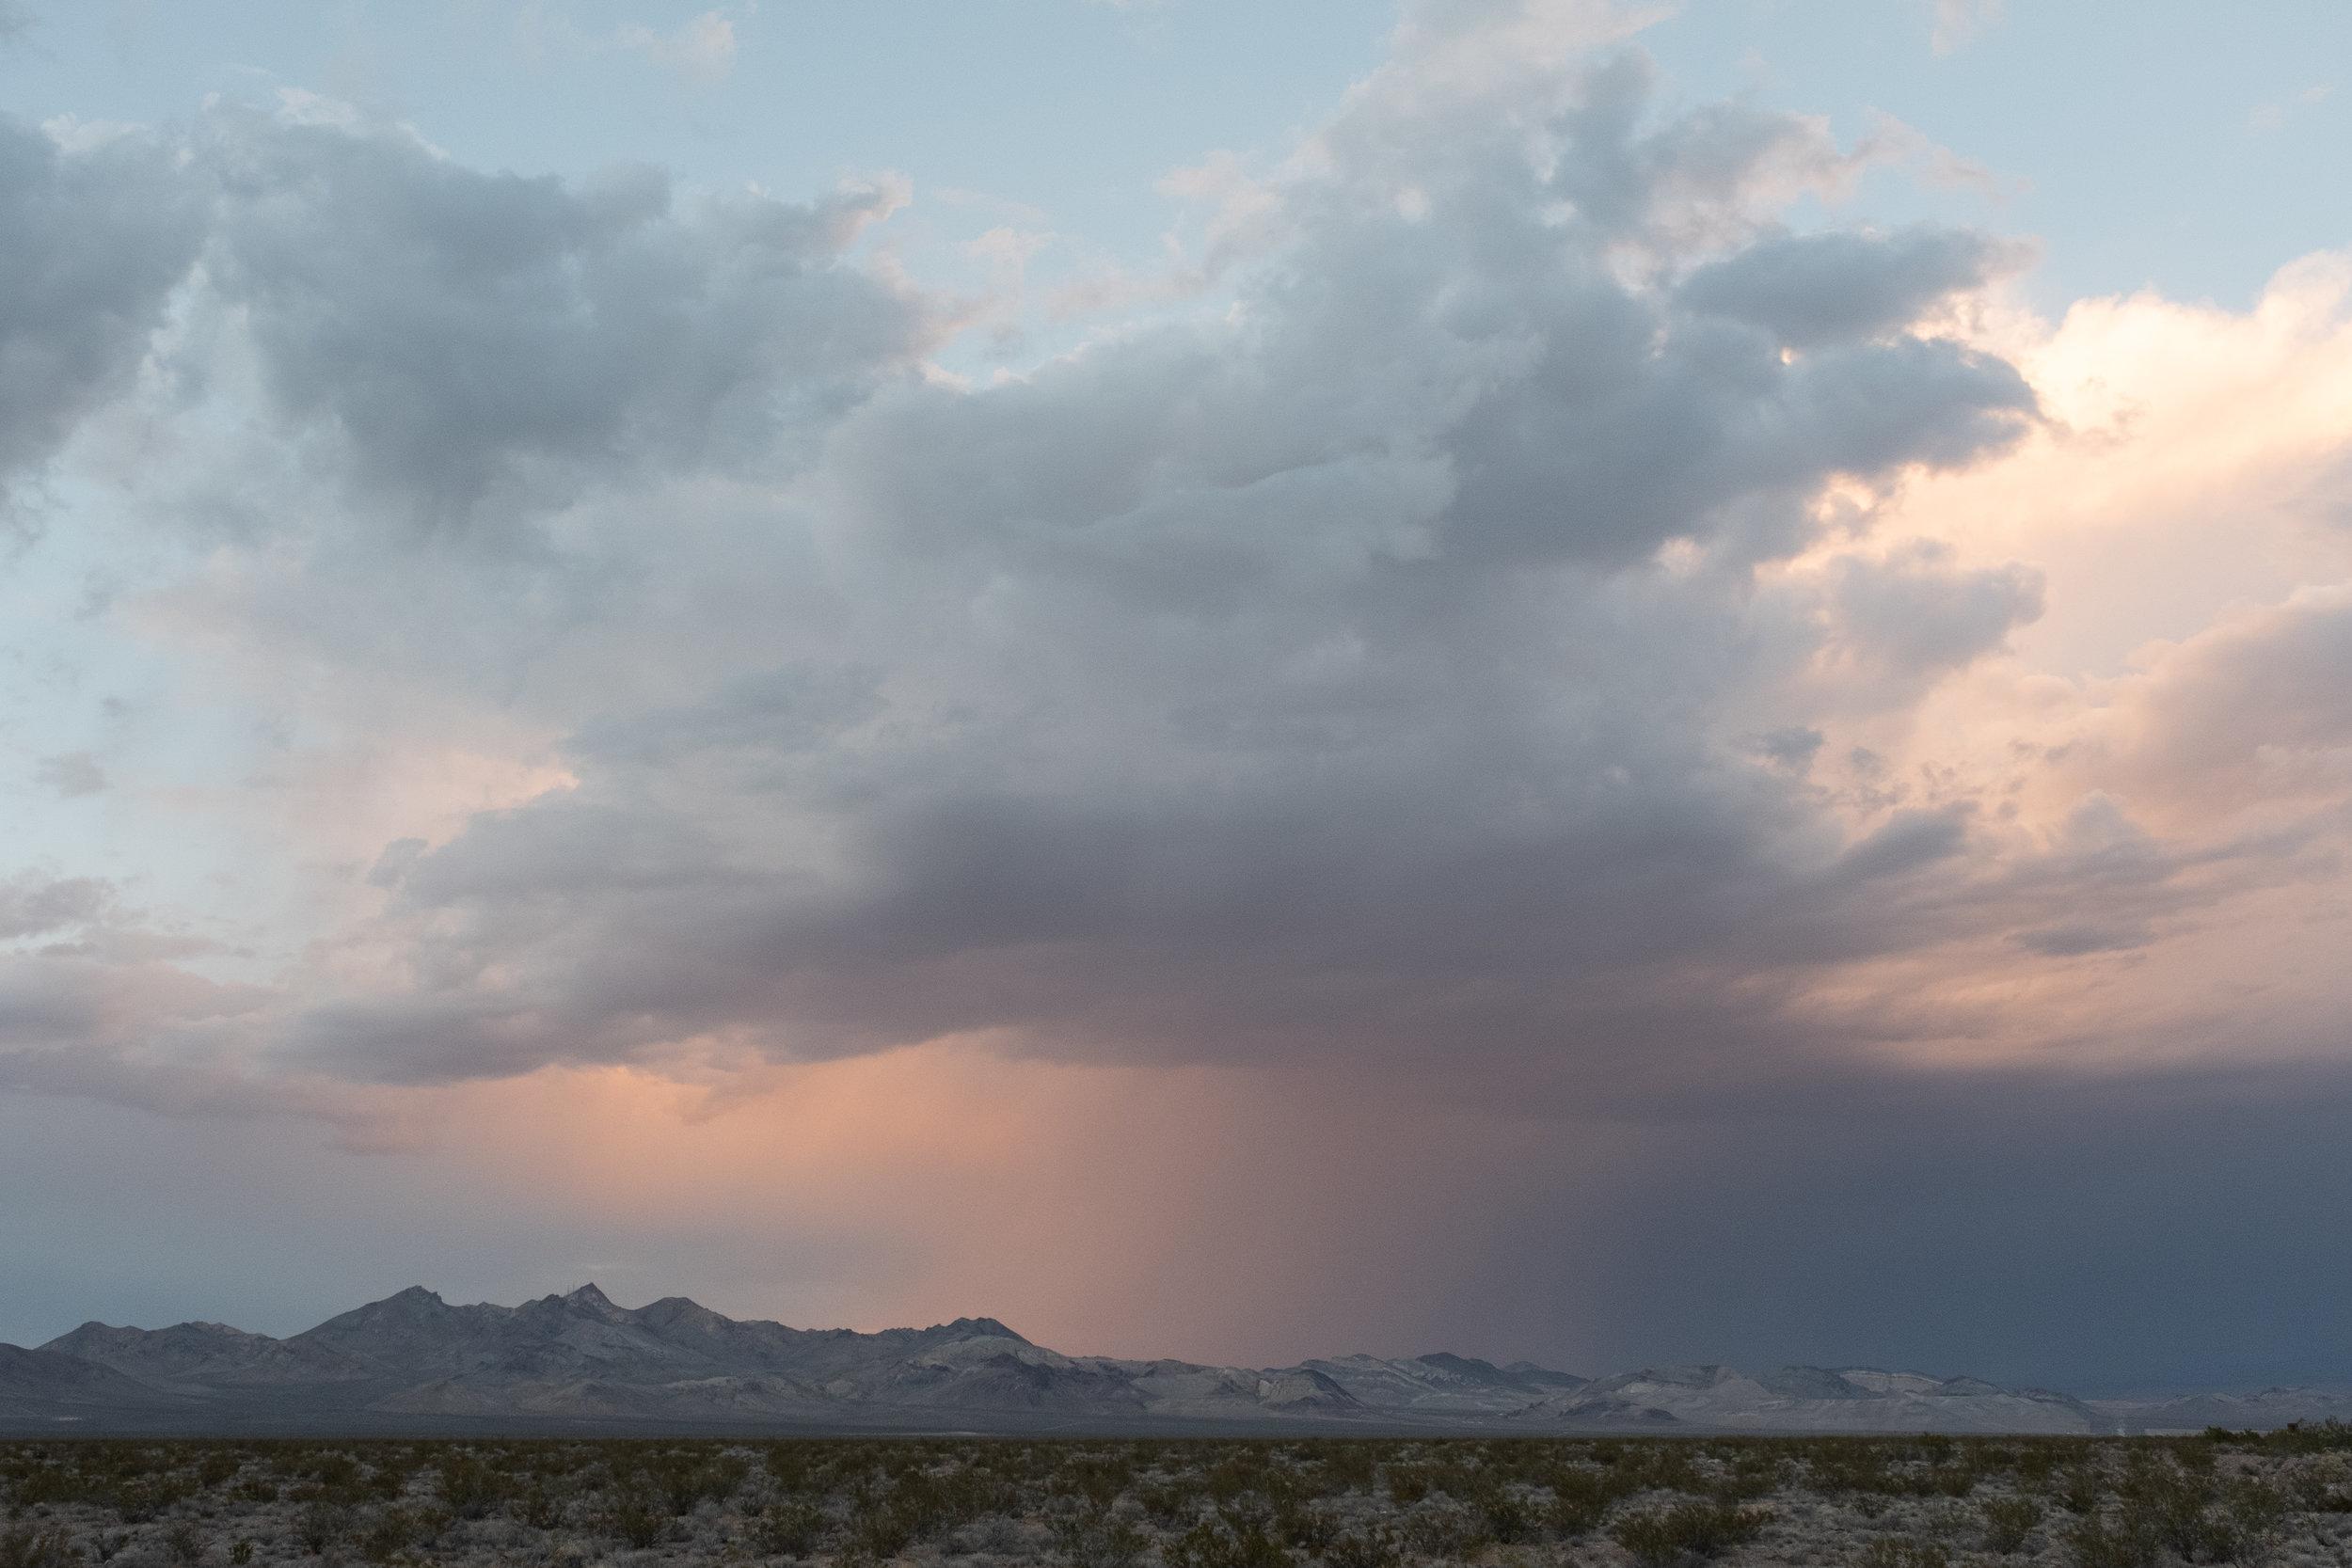 Death_Valley_National_Park7.jpg